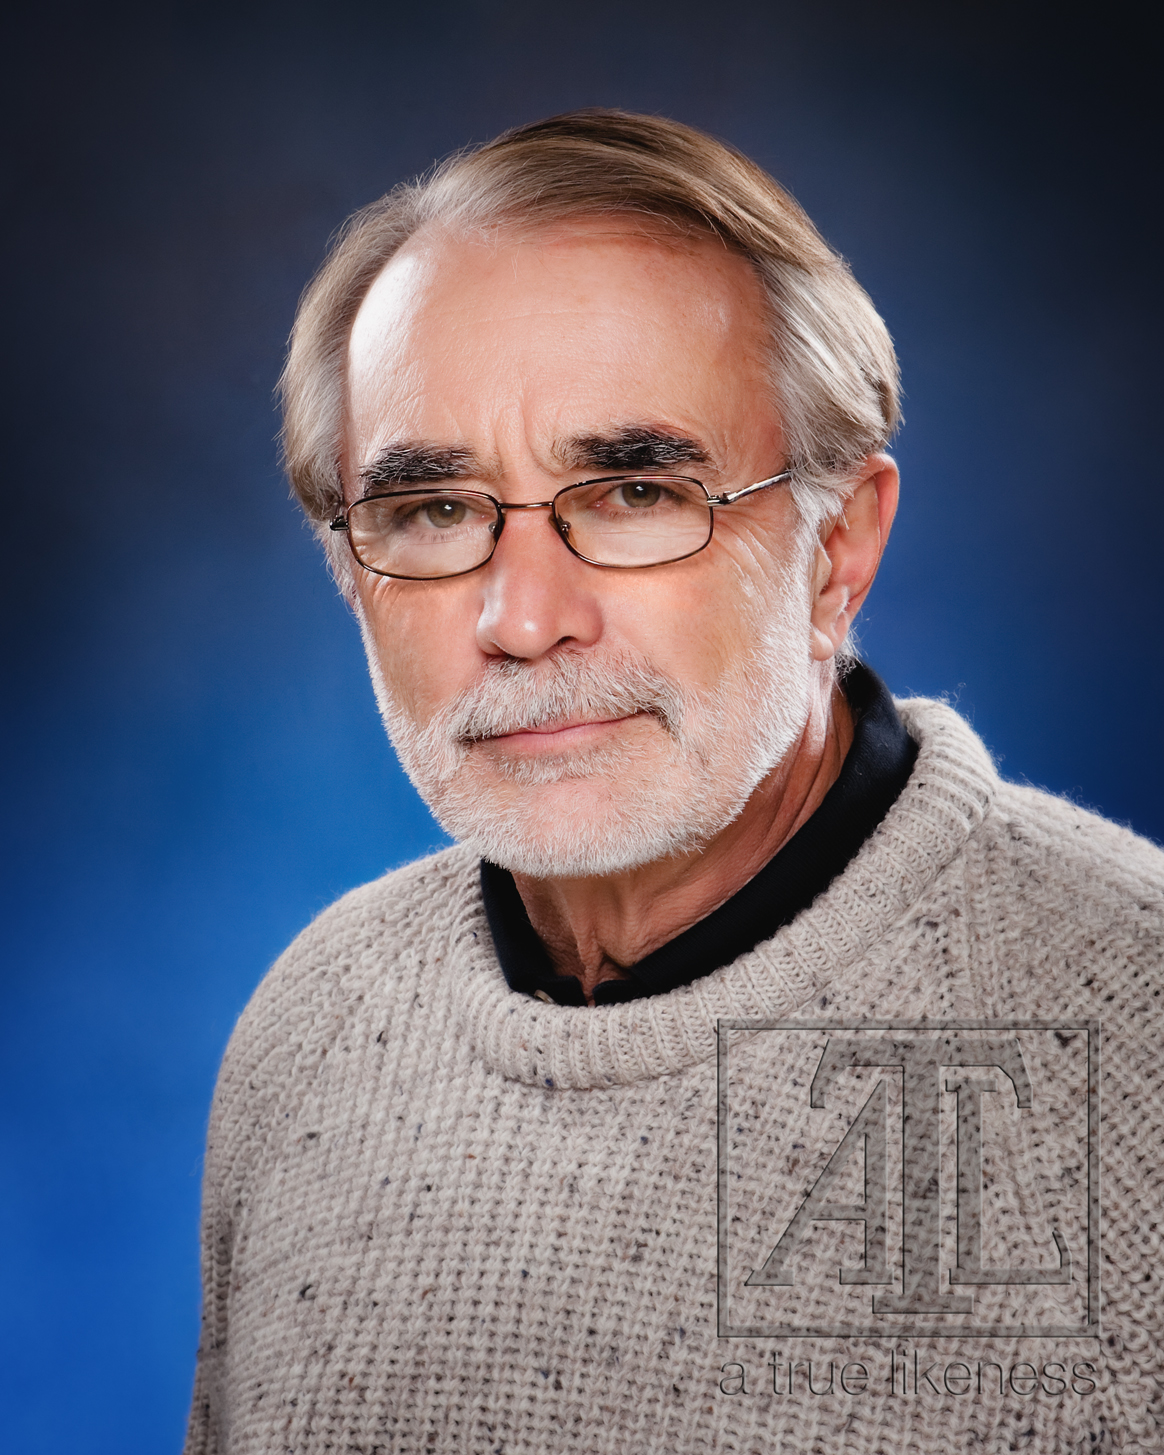 John Freiburger